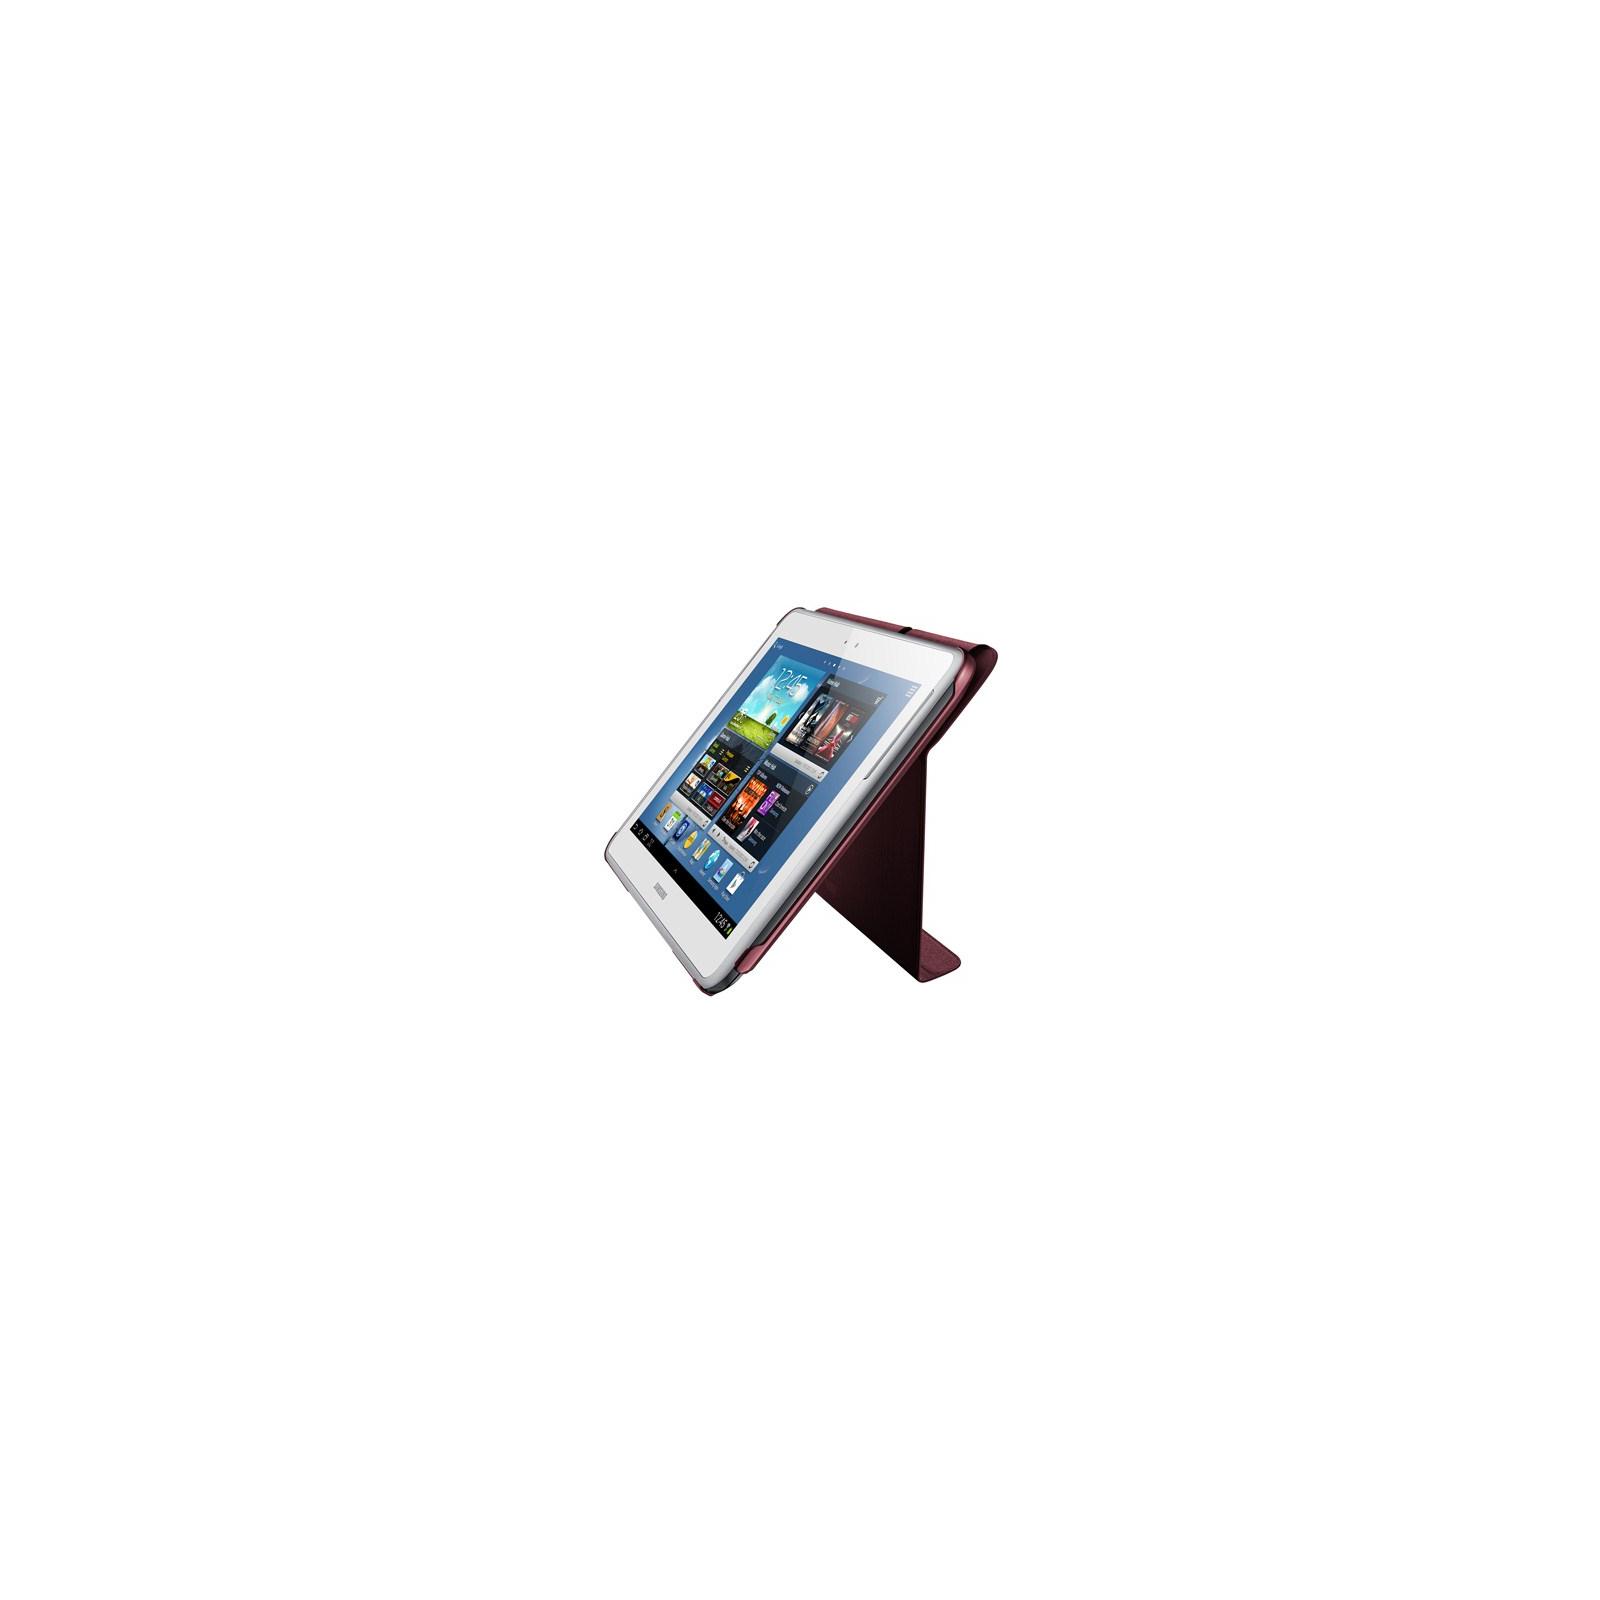 "Чехол для планшета Samsung N8000, 10.1"" Garnet Red (EFC-1G2NRECSTD) изображение 2"